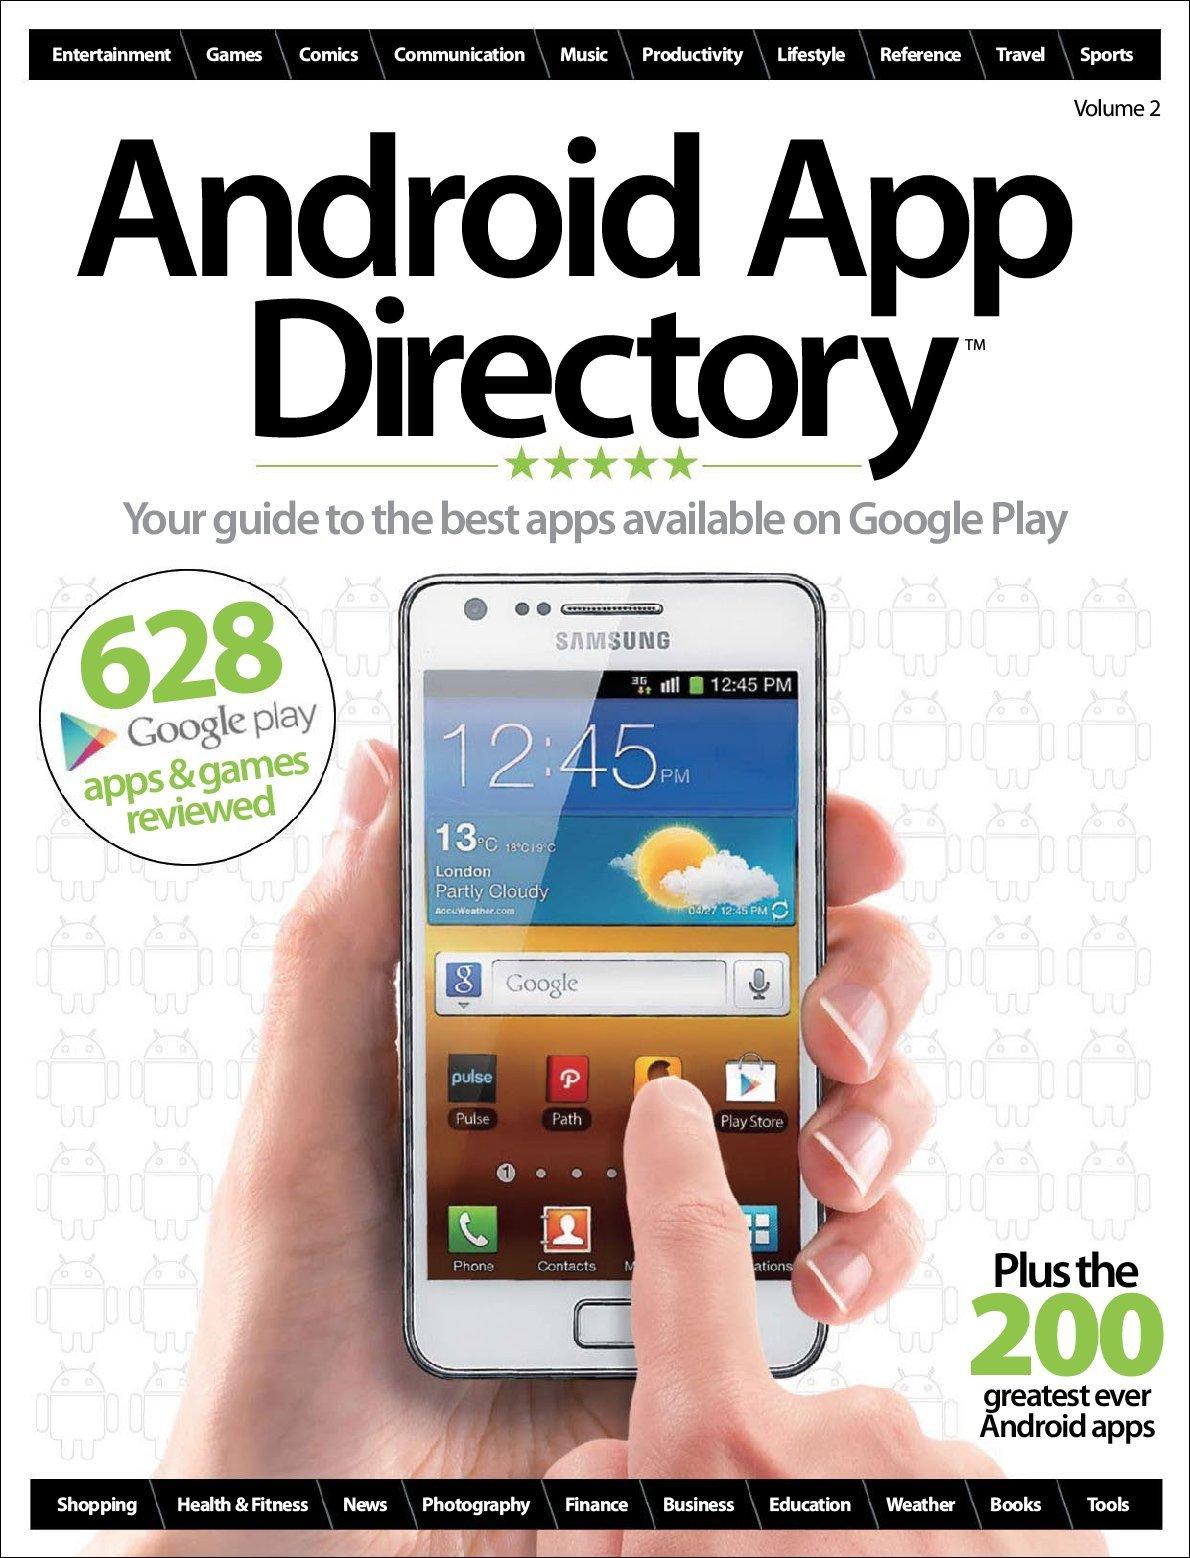 Android App Directory Vol 2 Digital